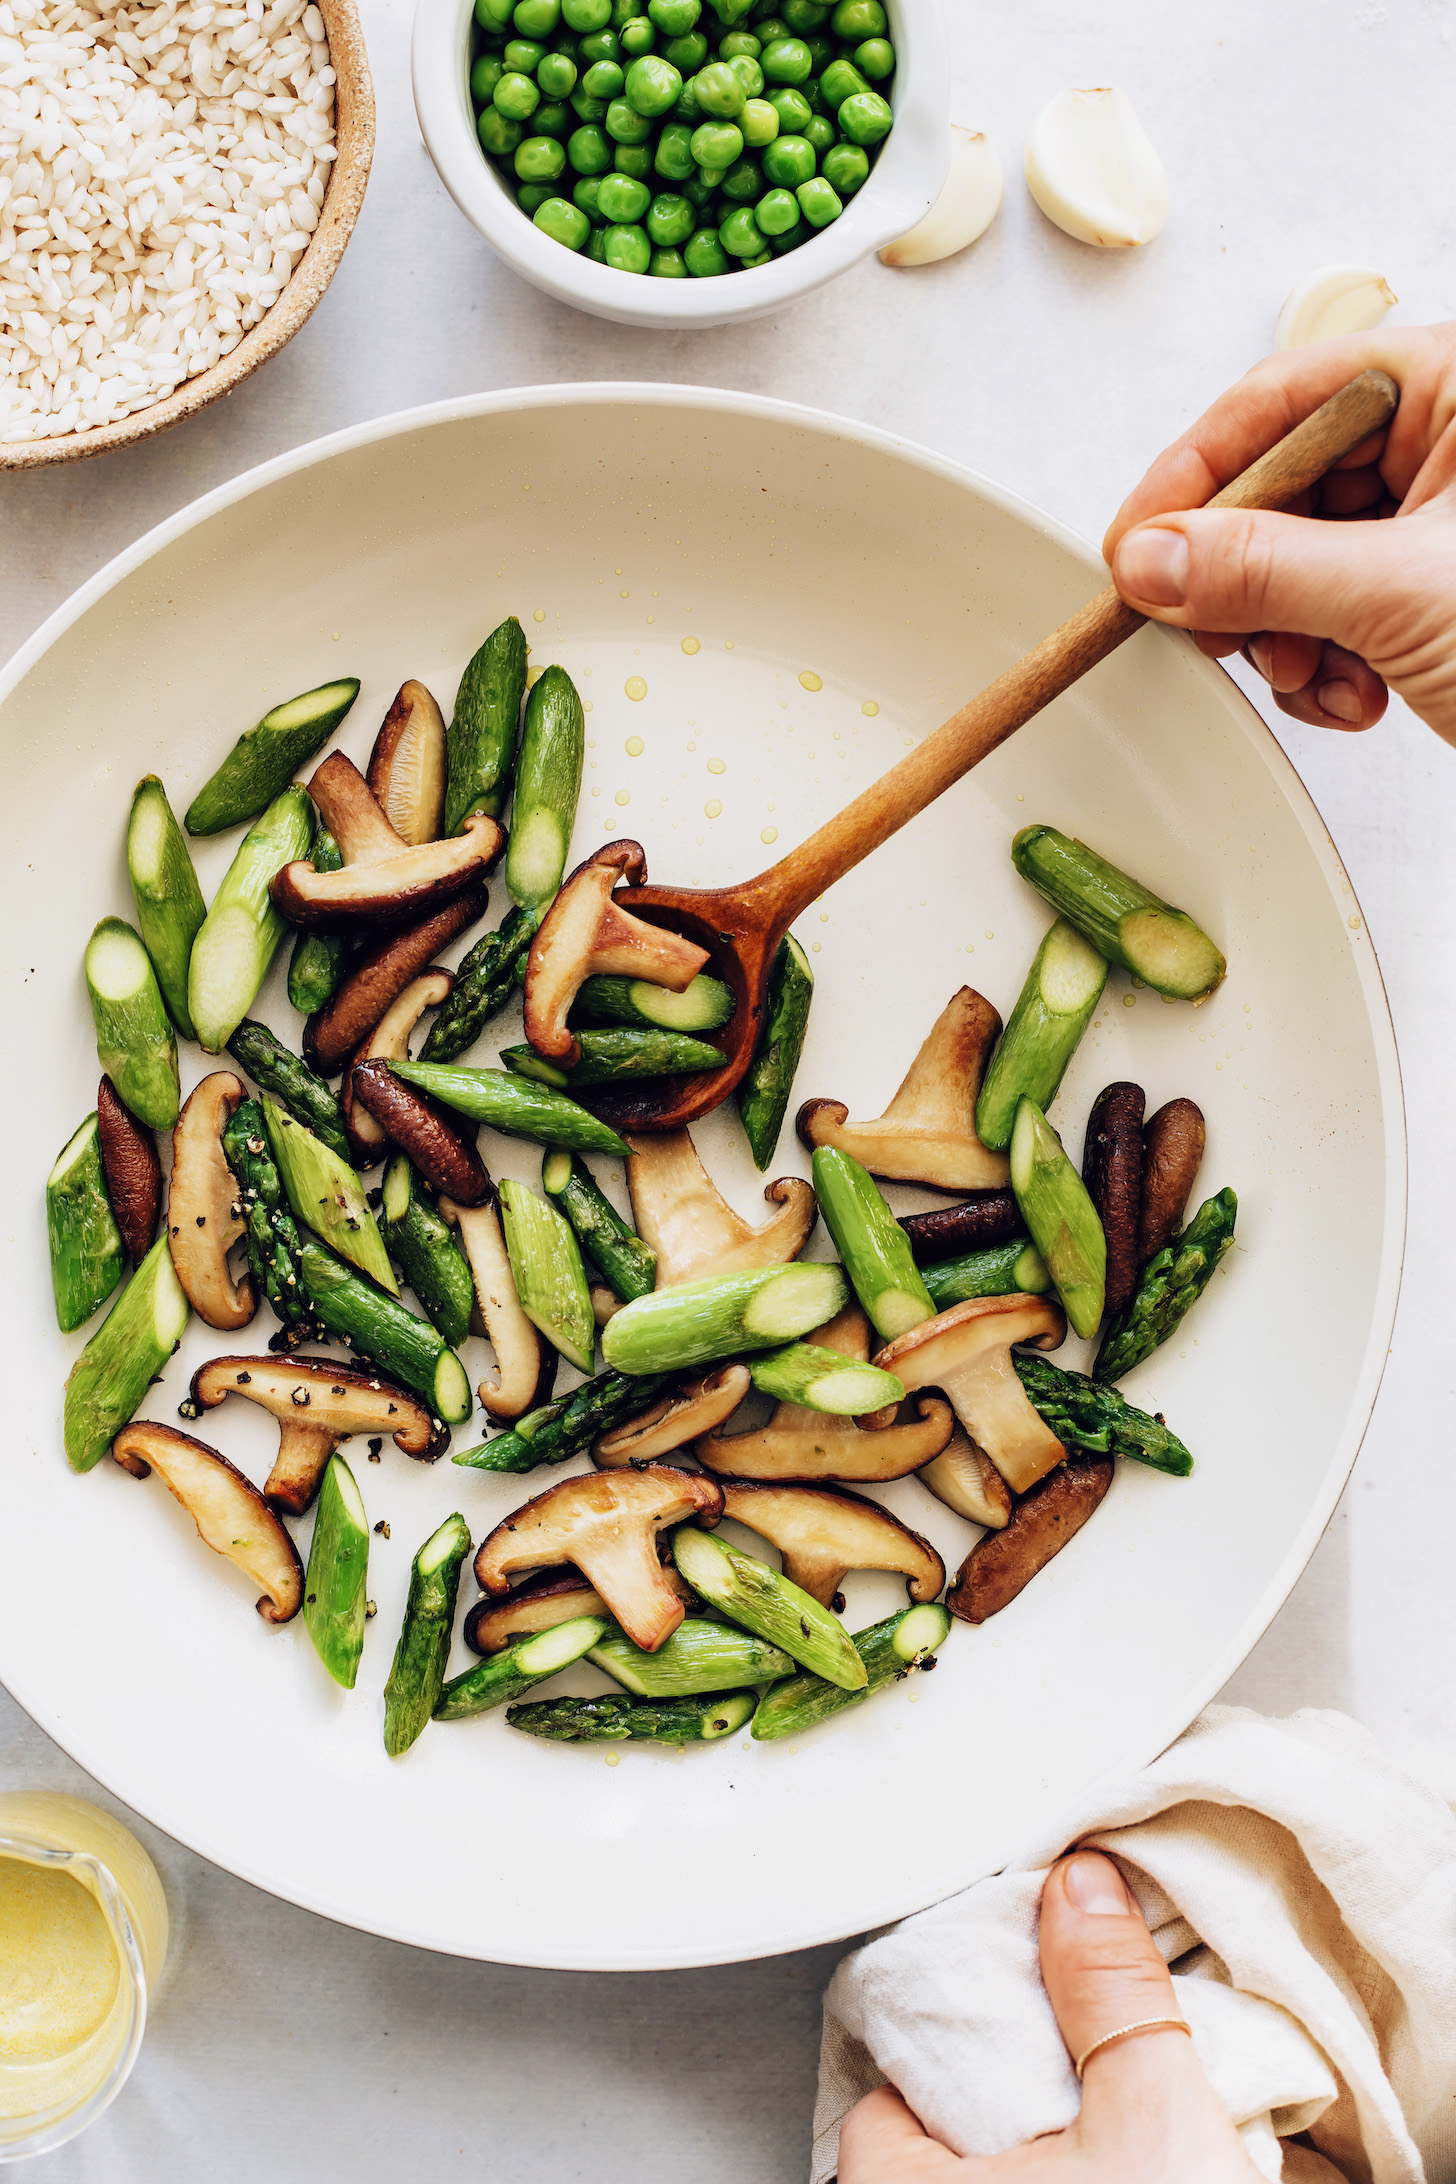 Sautéing asparagus and mushrooms with salt and pepper